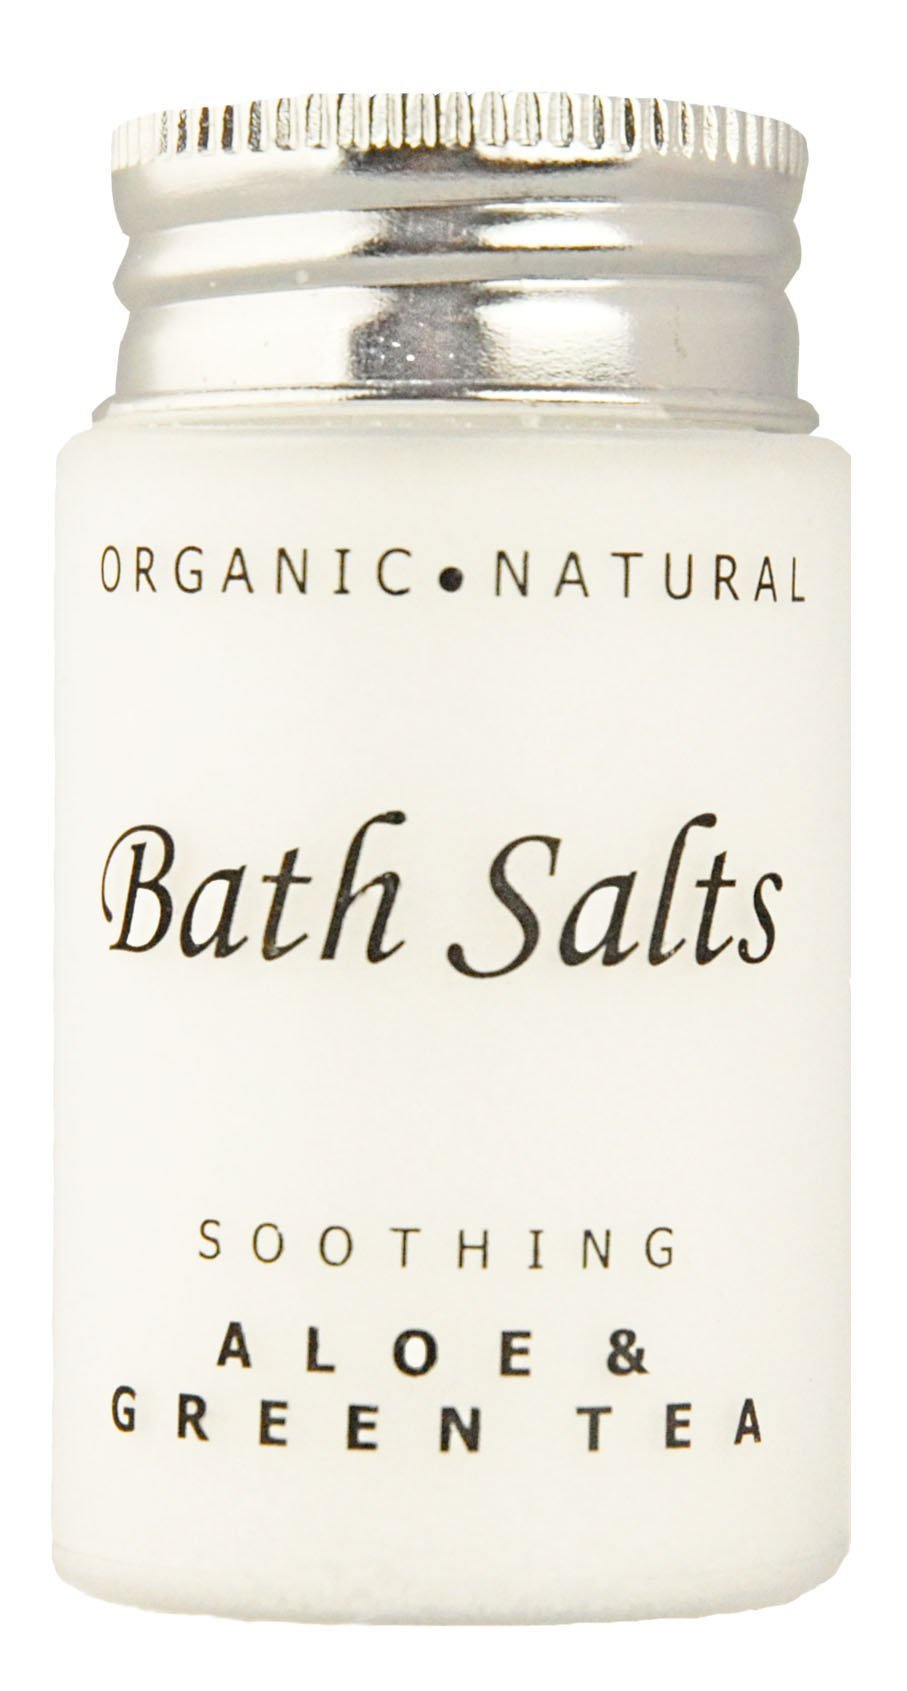 Soothing Aloe and Green Tea Bath Salts, Single Use Hospitality/Travel Size Jar (Case of 300)